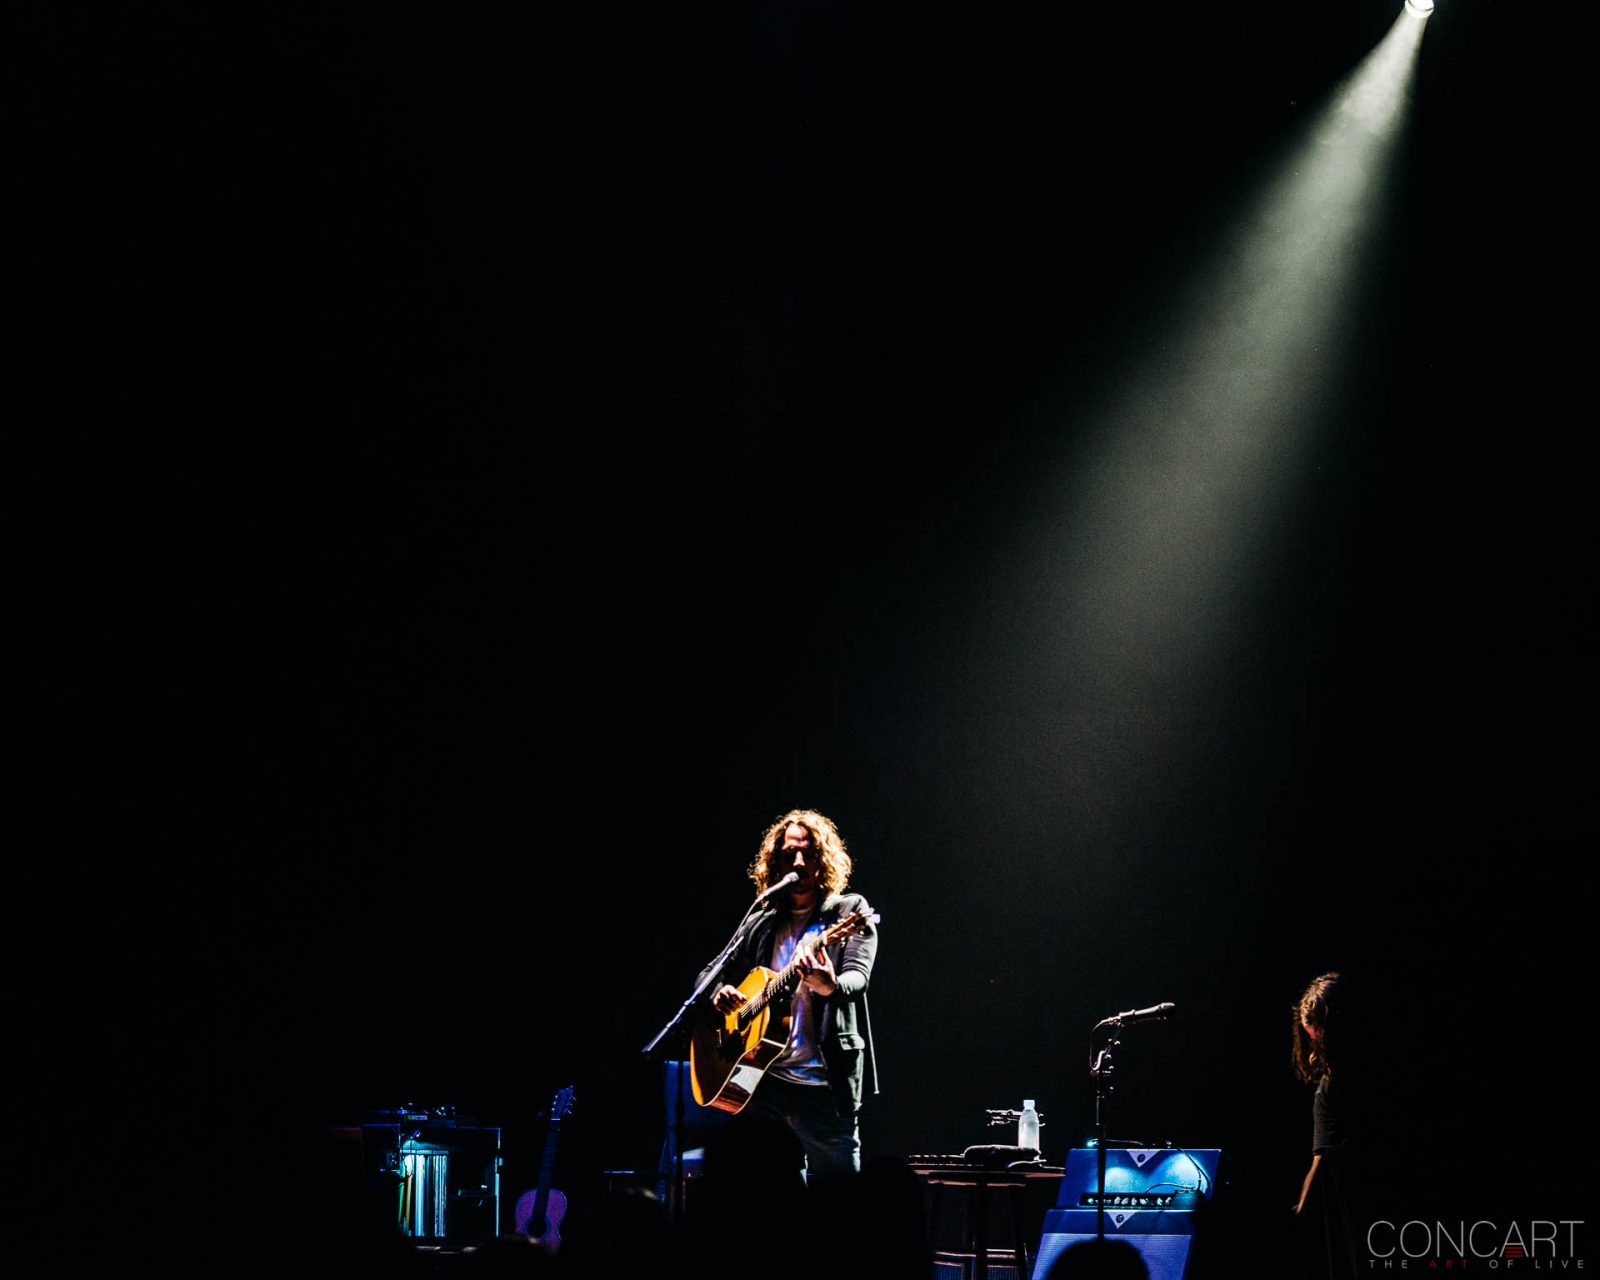 Chris Cornell photo by Sean Molin 9